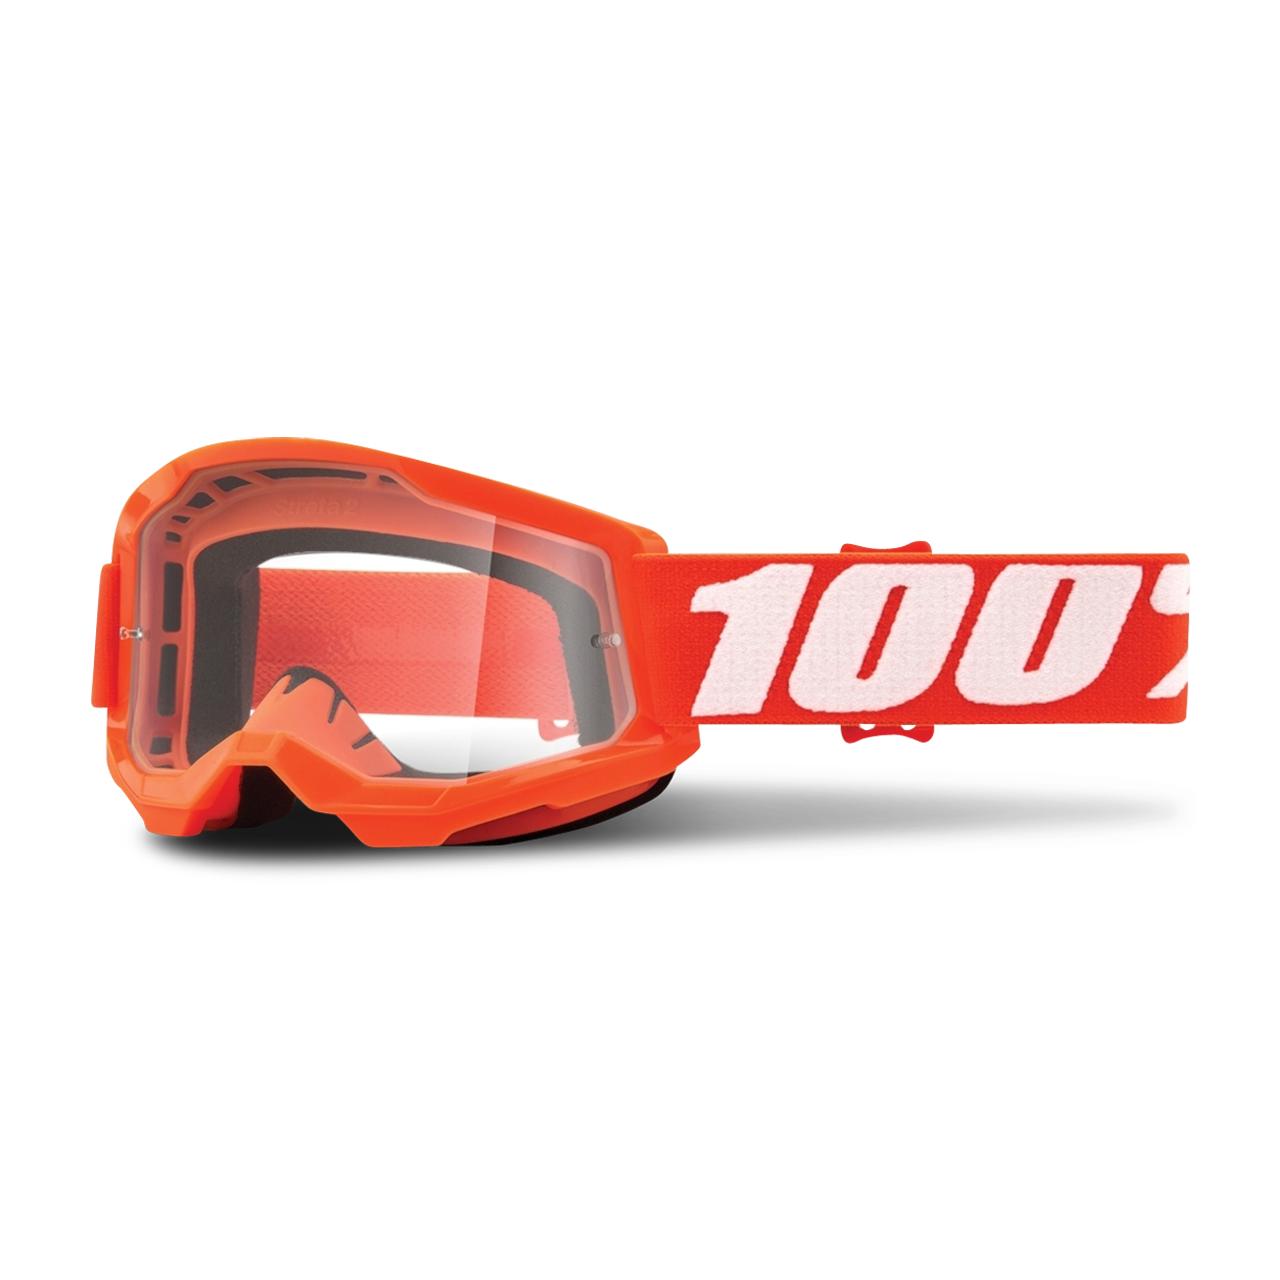 100% Masque Cross Enfant 100% Strata 2 Orange